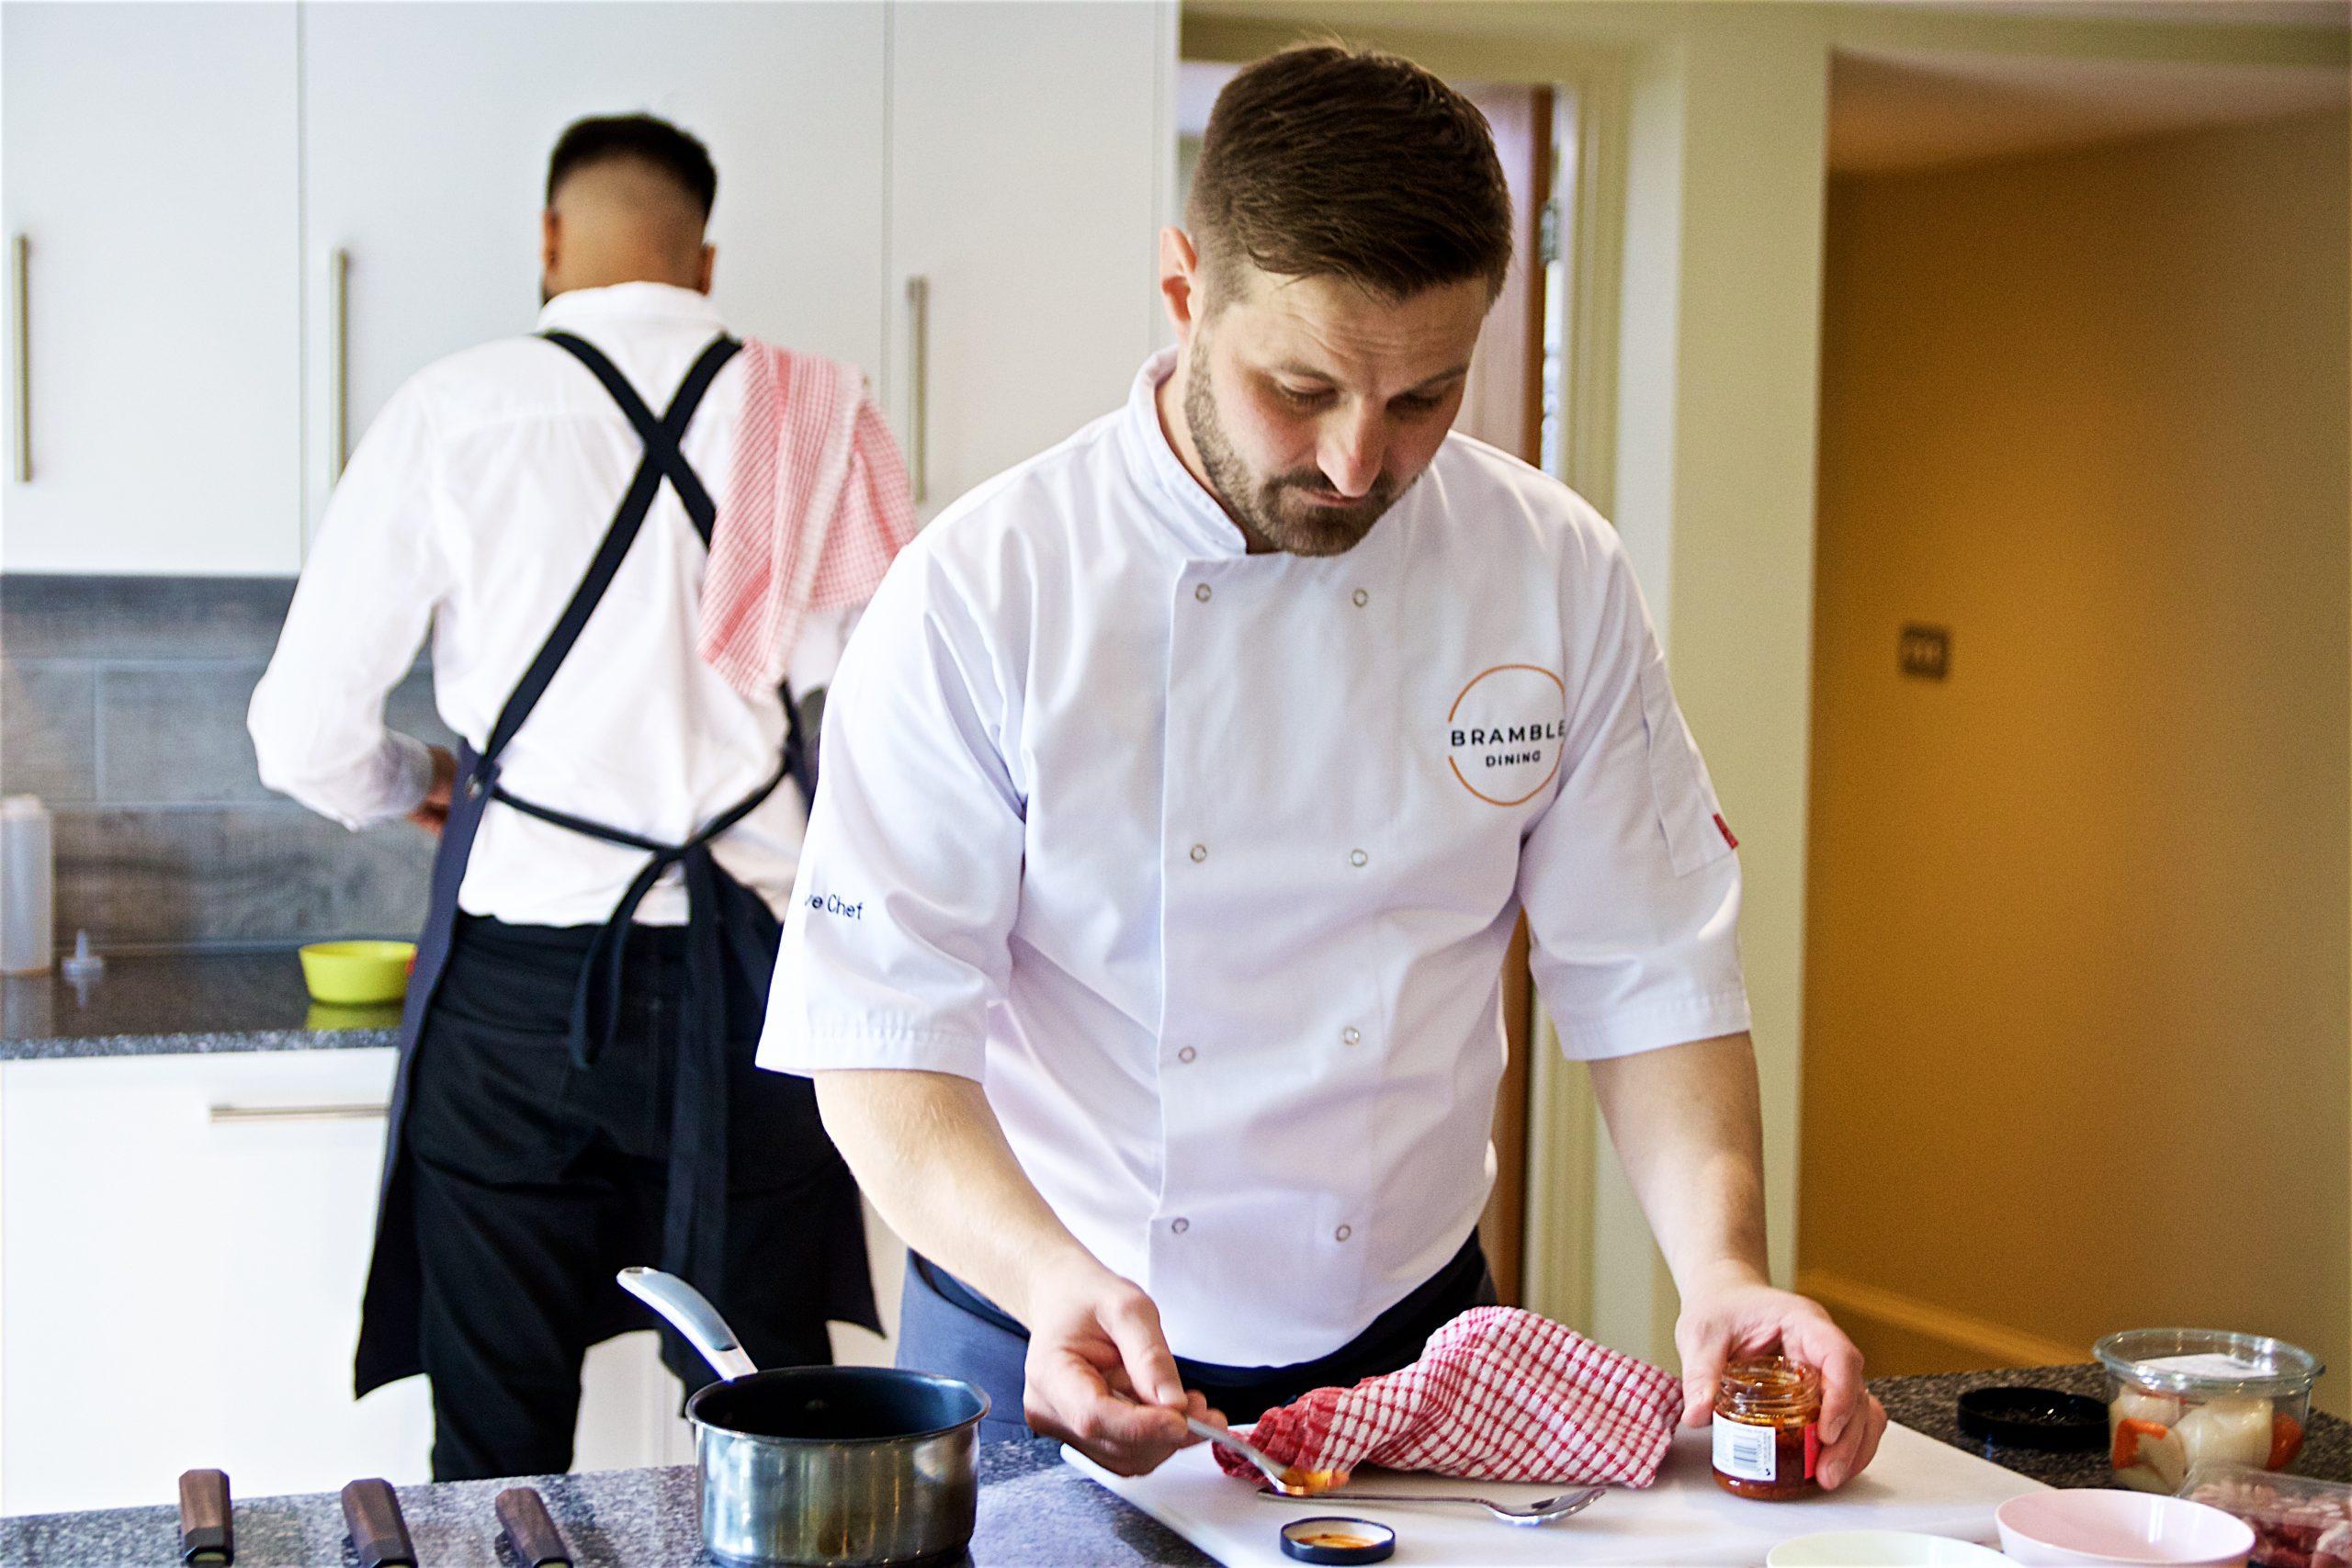 Fine food, Bramble Dining, Richard Bramble